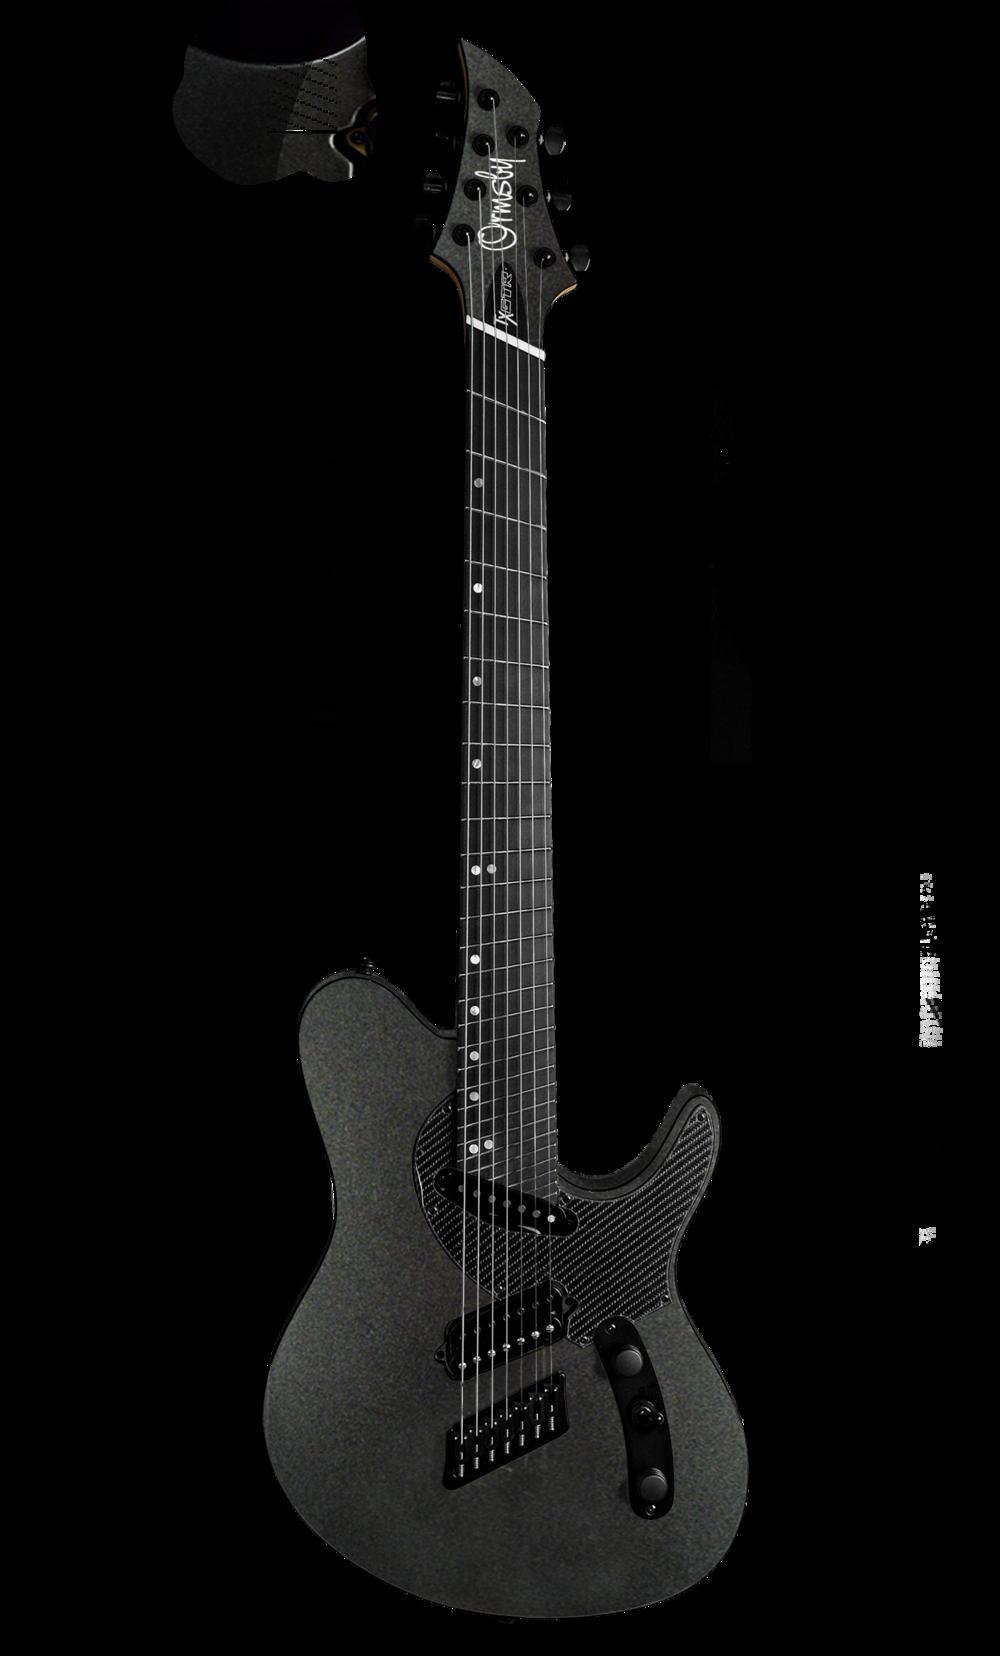 TX GTR Carbon MULTISCALE - Gunmetal (6, 7 & 8 String)